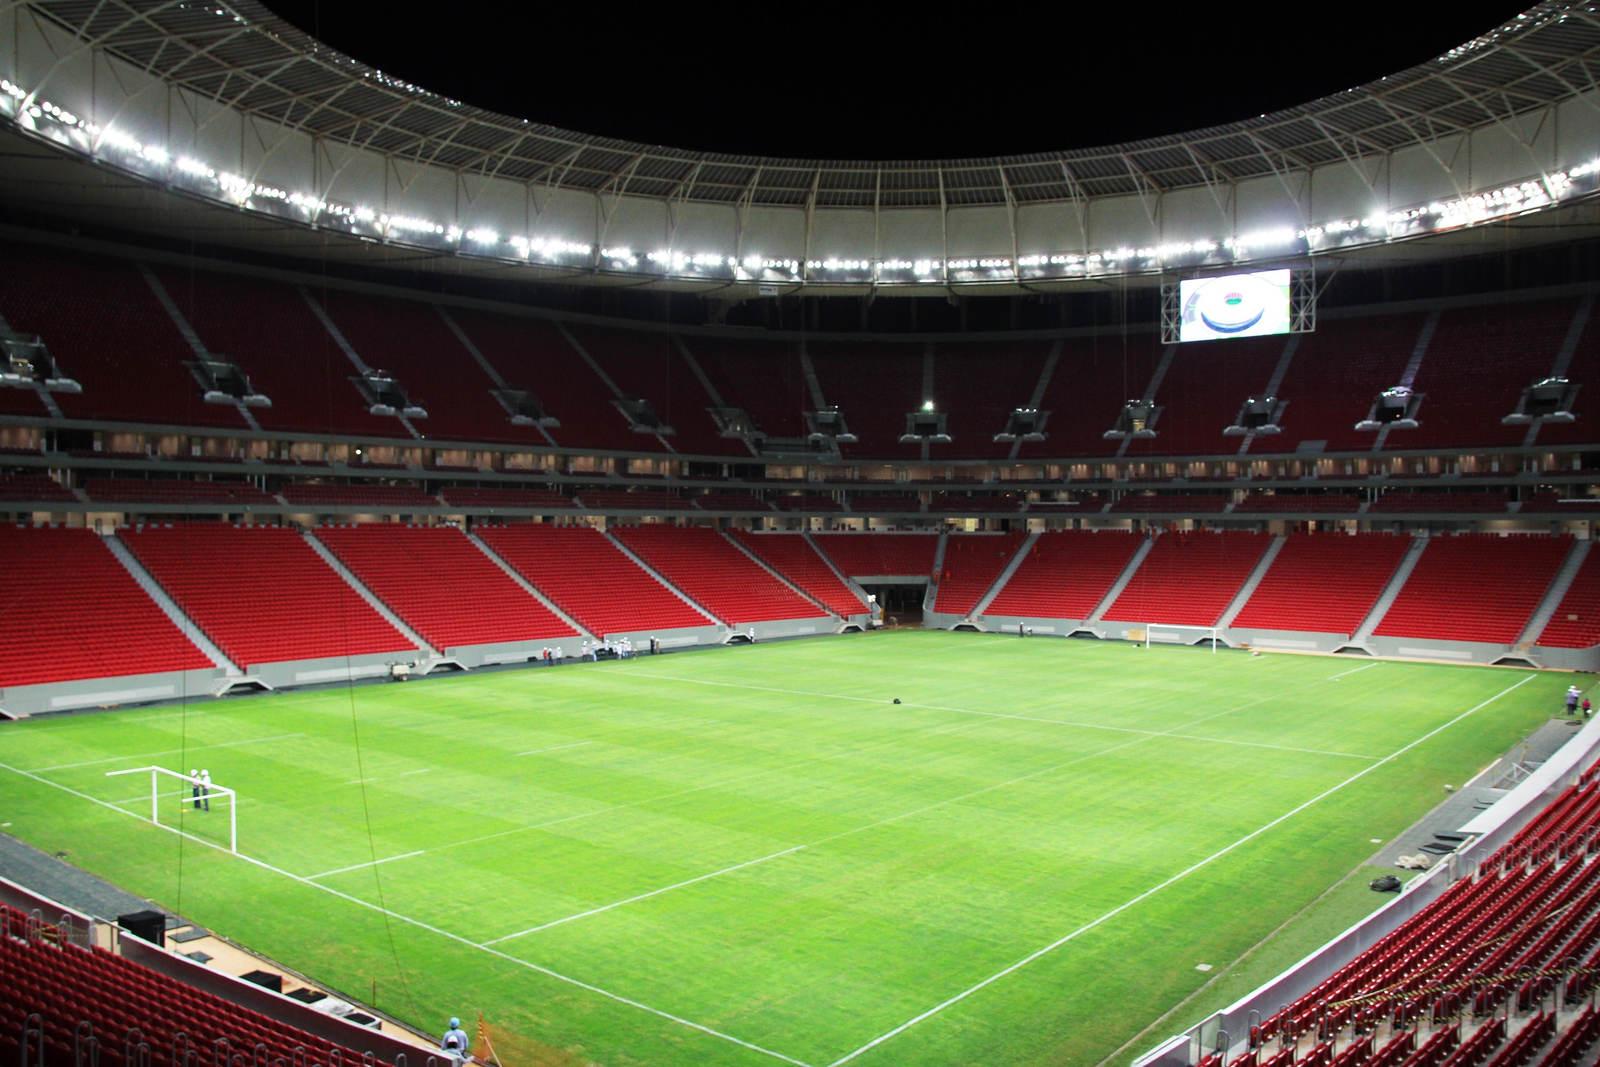 Est dio nacional de bras lia man garrincha for Estadio arena